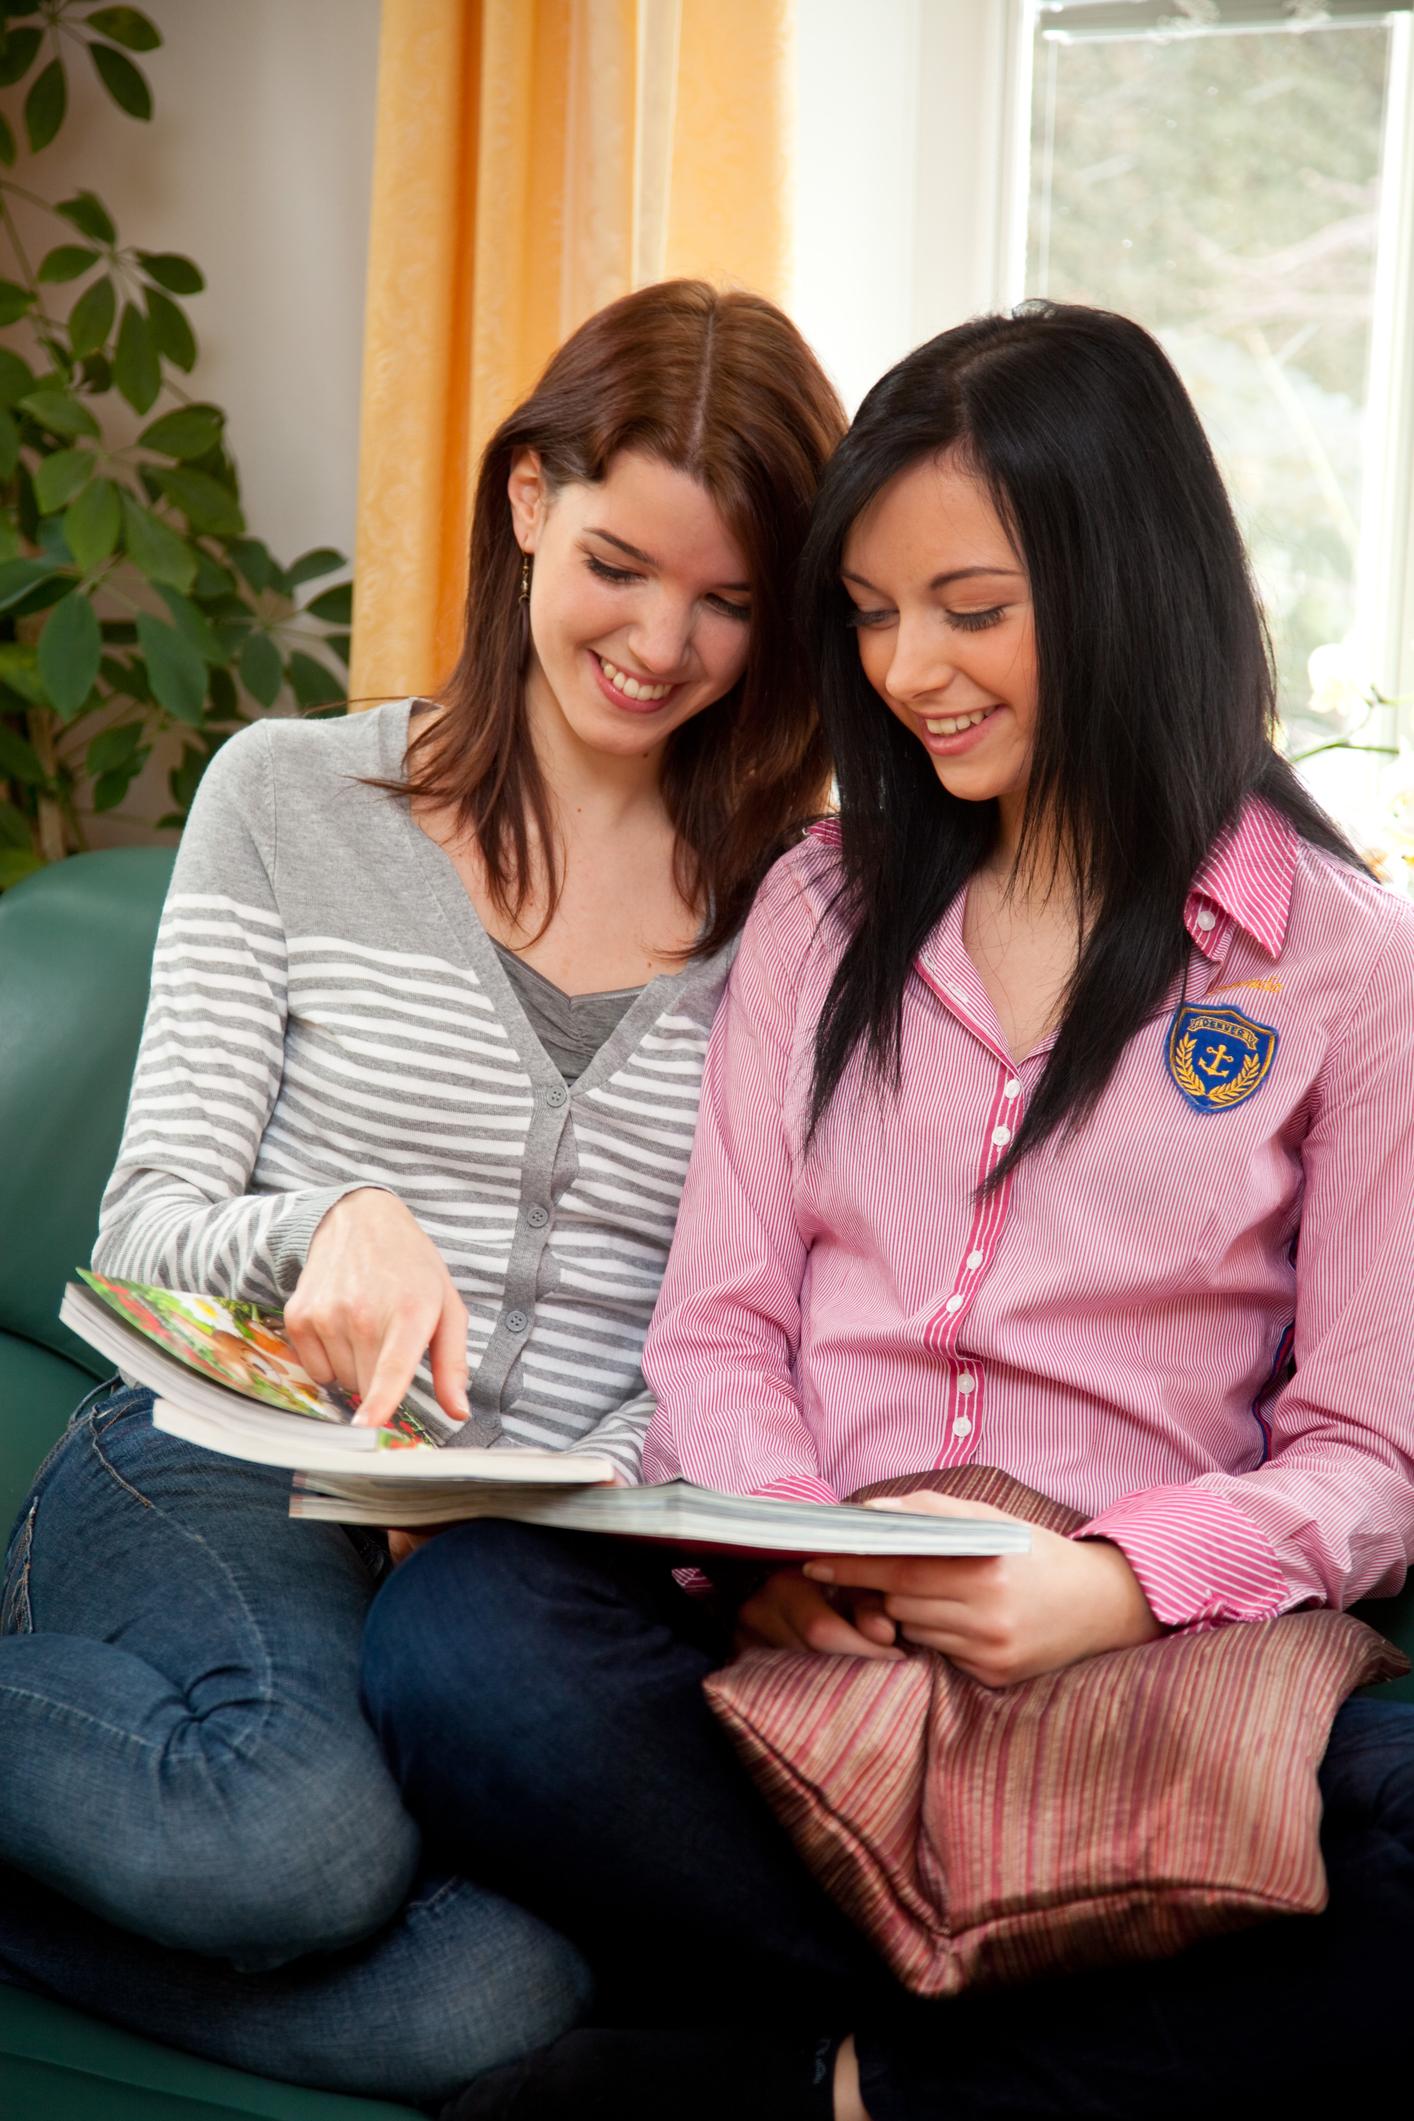 Two Girls Catalog Shopping